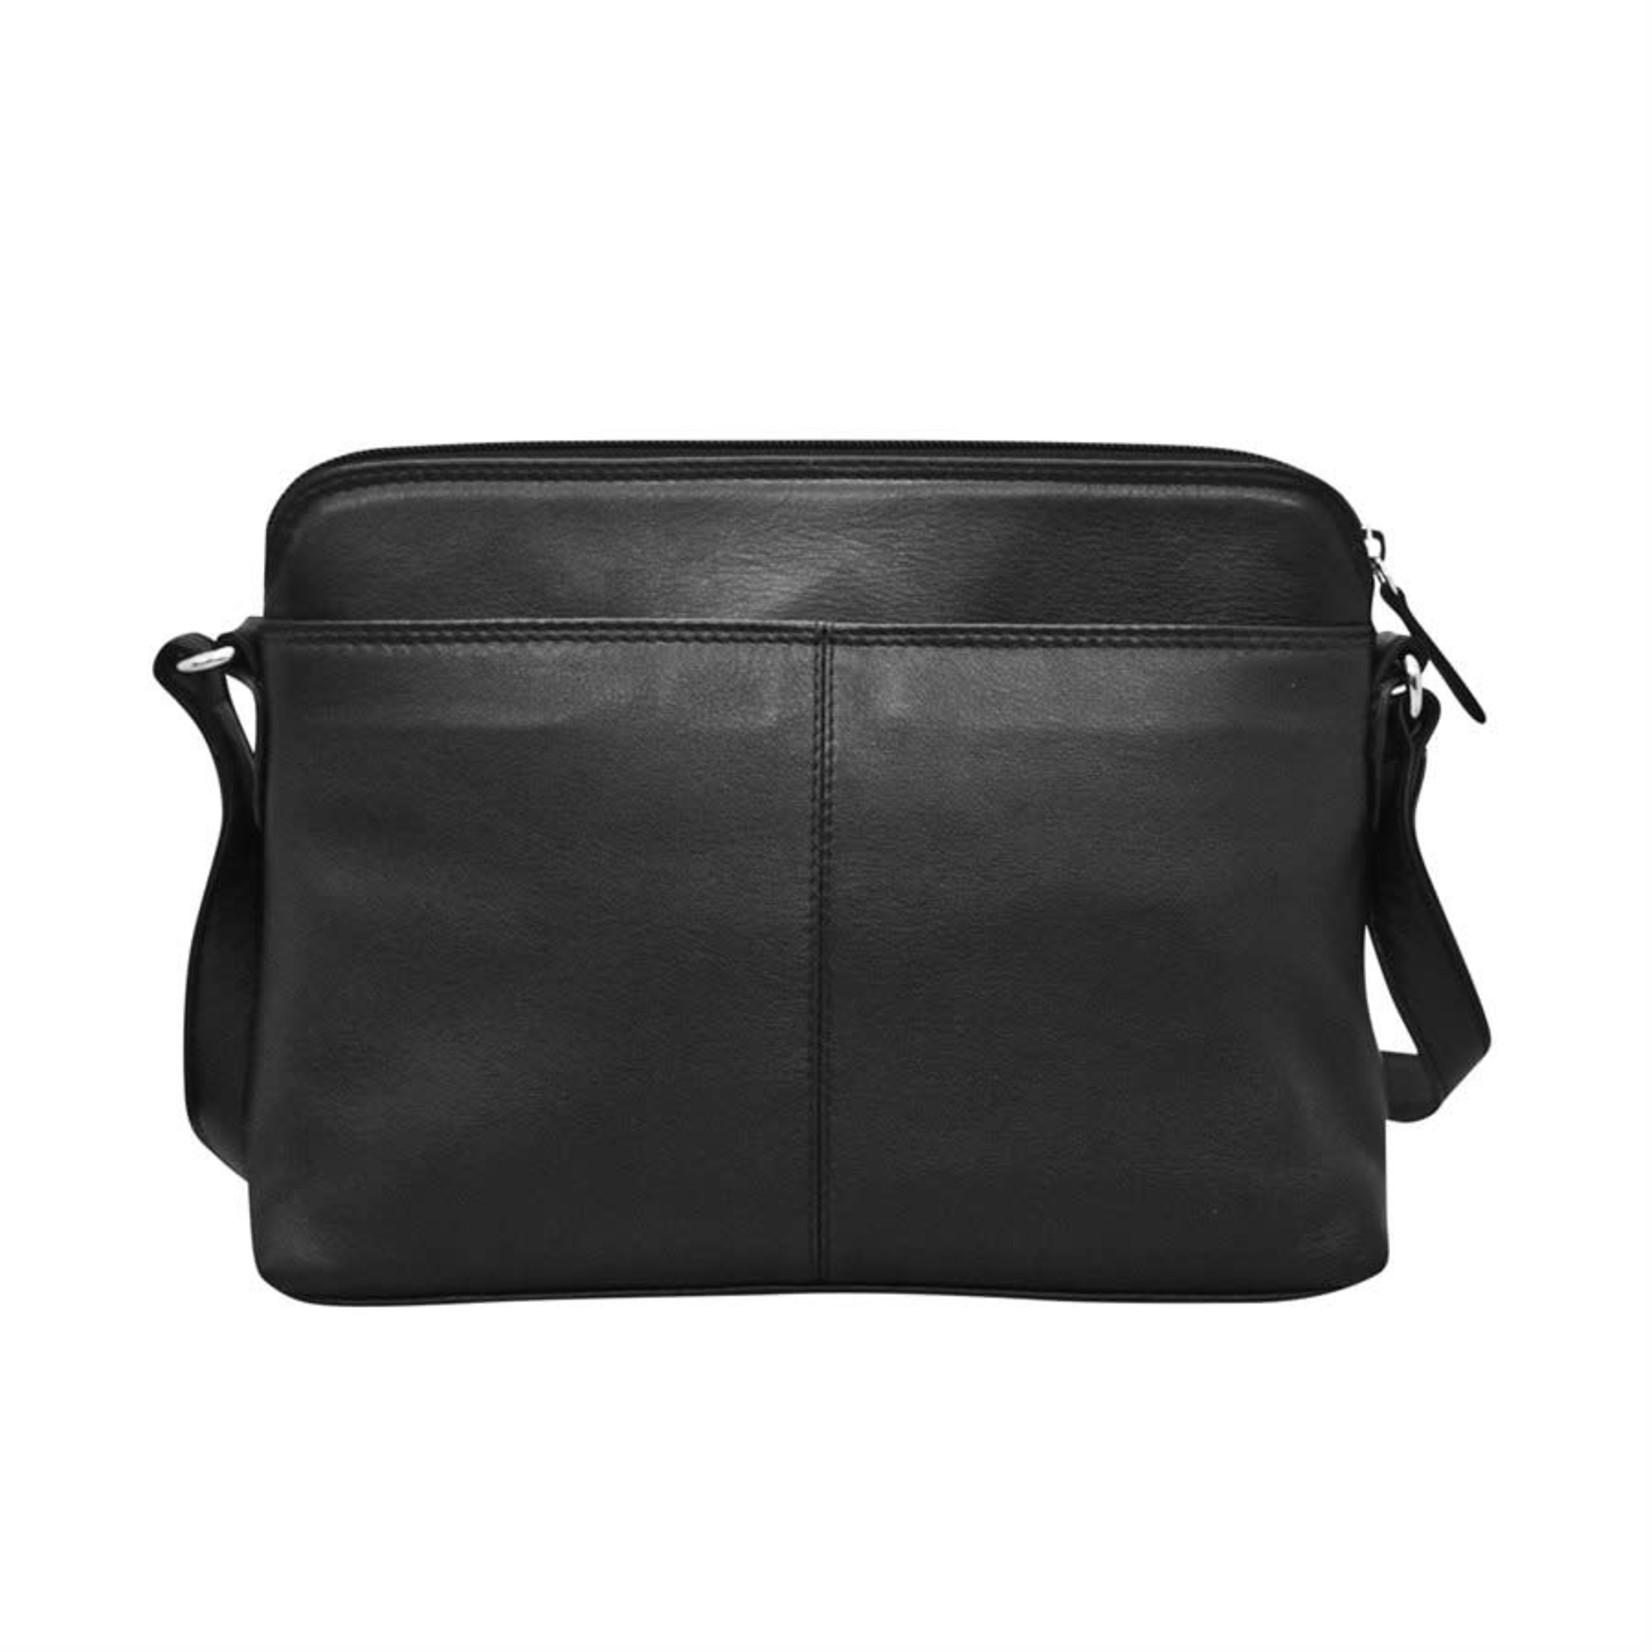 Leather Handbags and Accessories 6333 Walnut - Organizer Bag